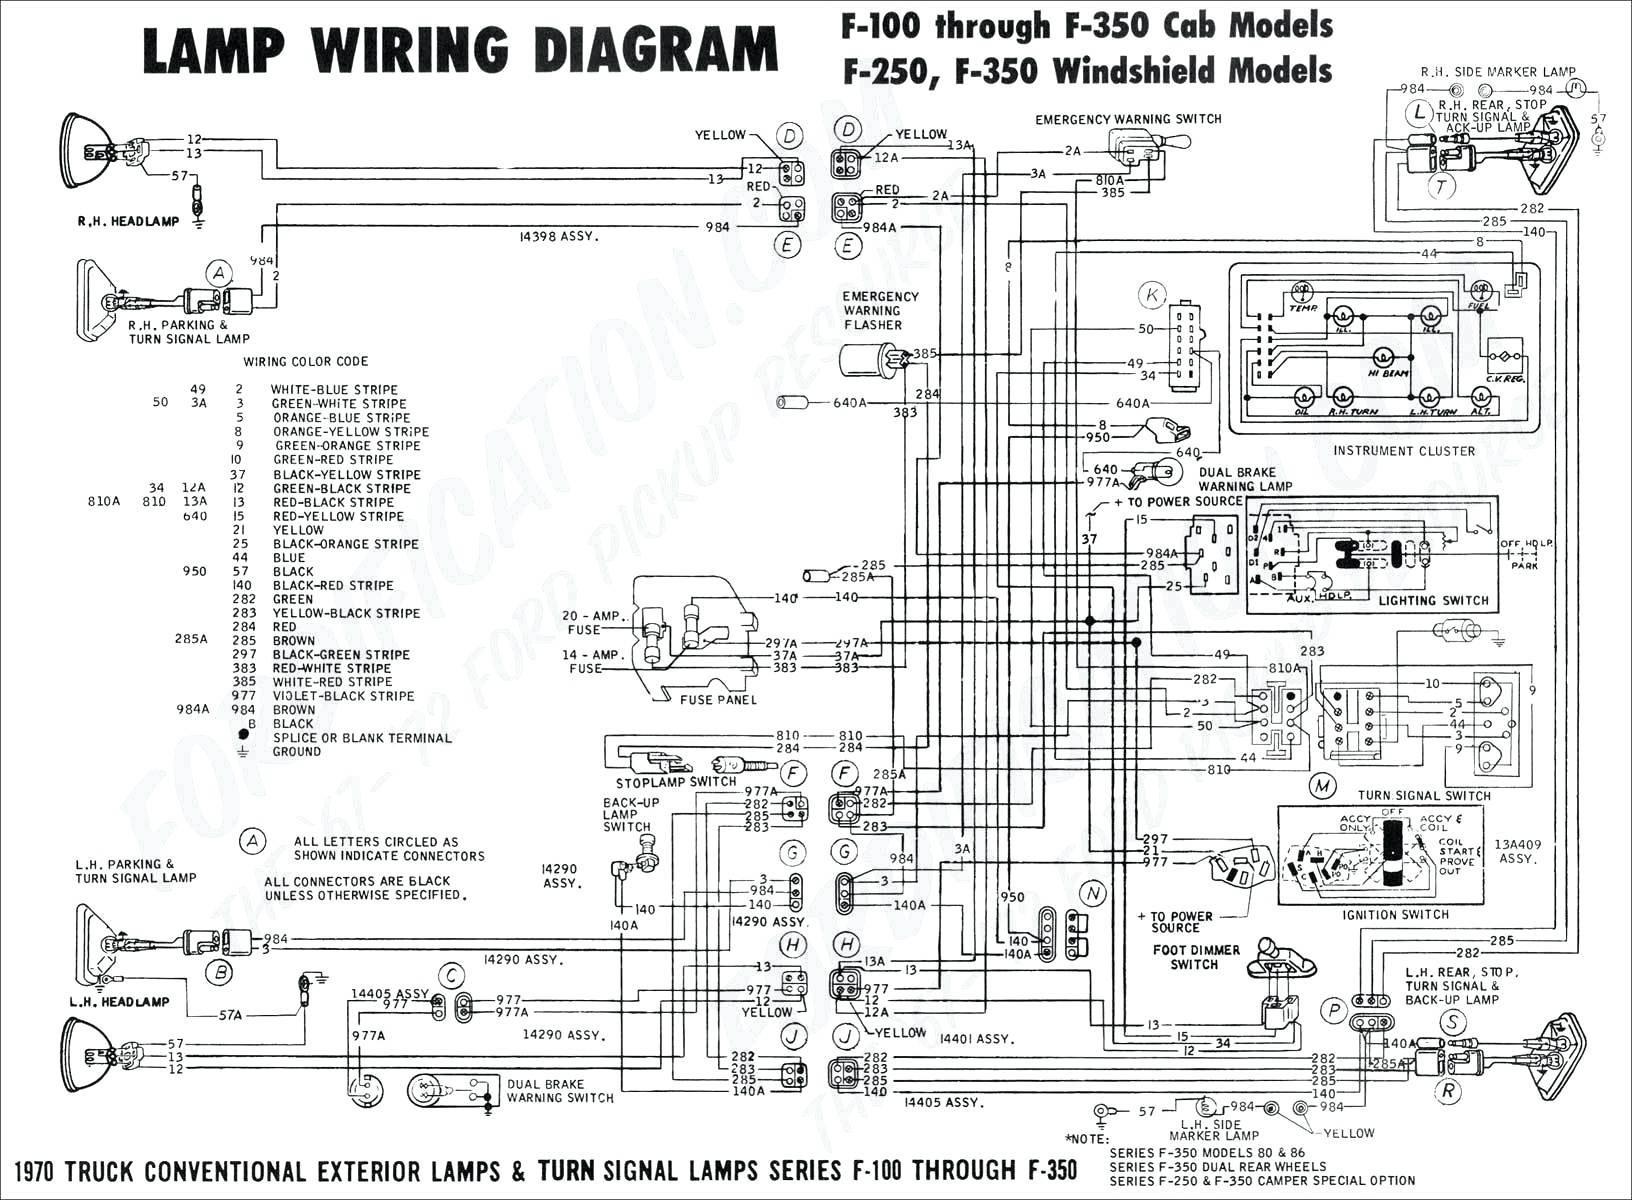 99 Honda Accord Spark Plug Wiring Diagram